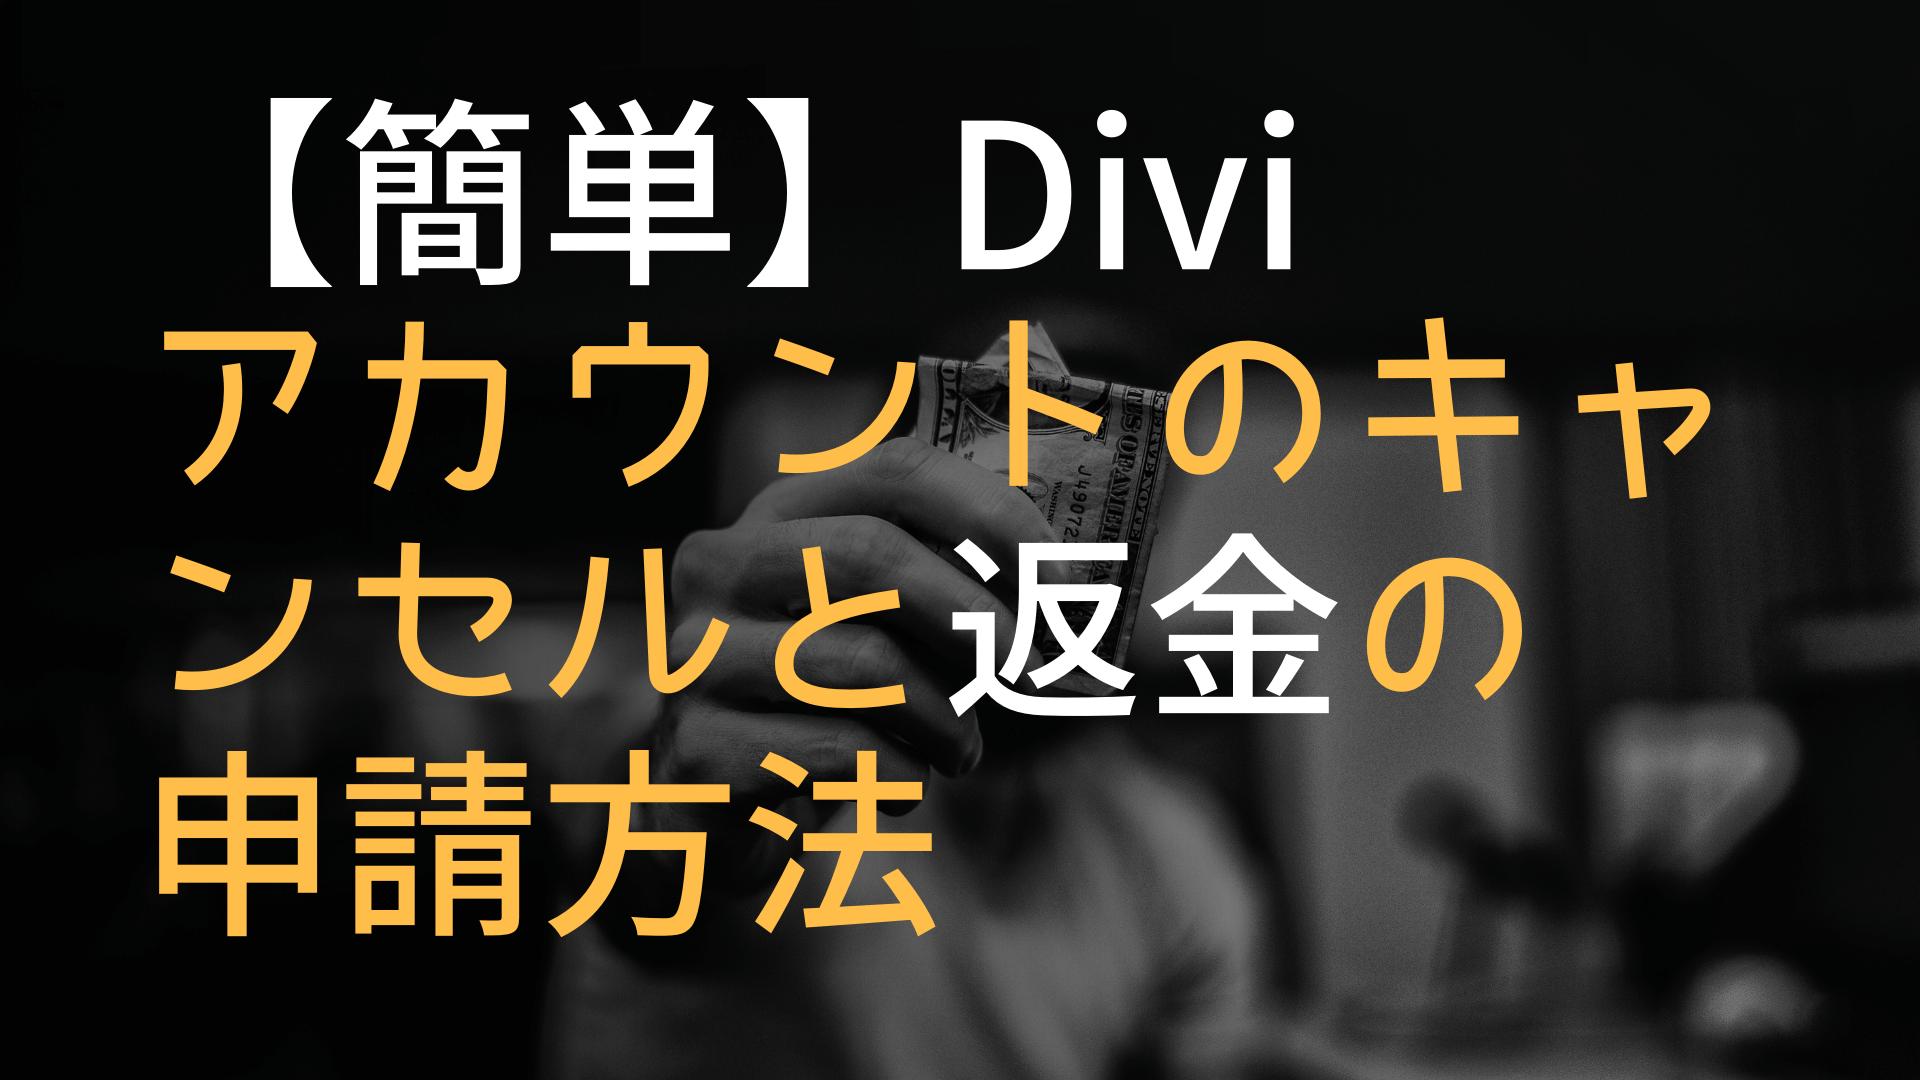 Divi Elegant Themesのアカウントのキャンセルと返金の申請方法